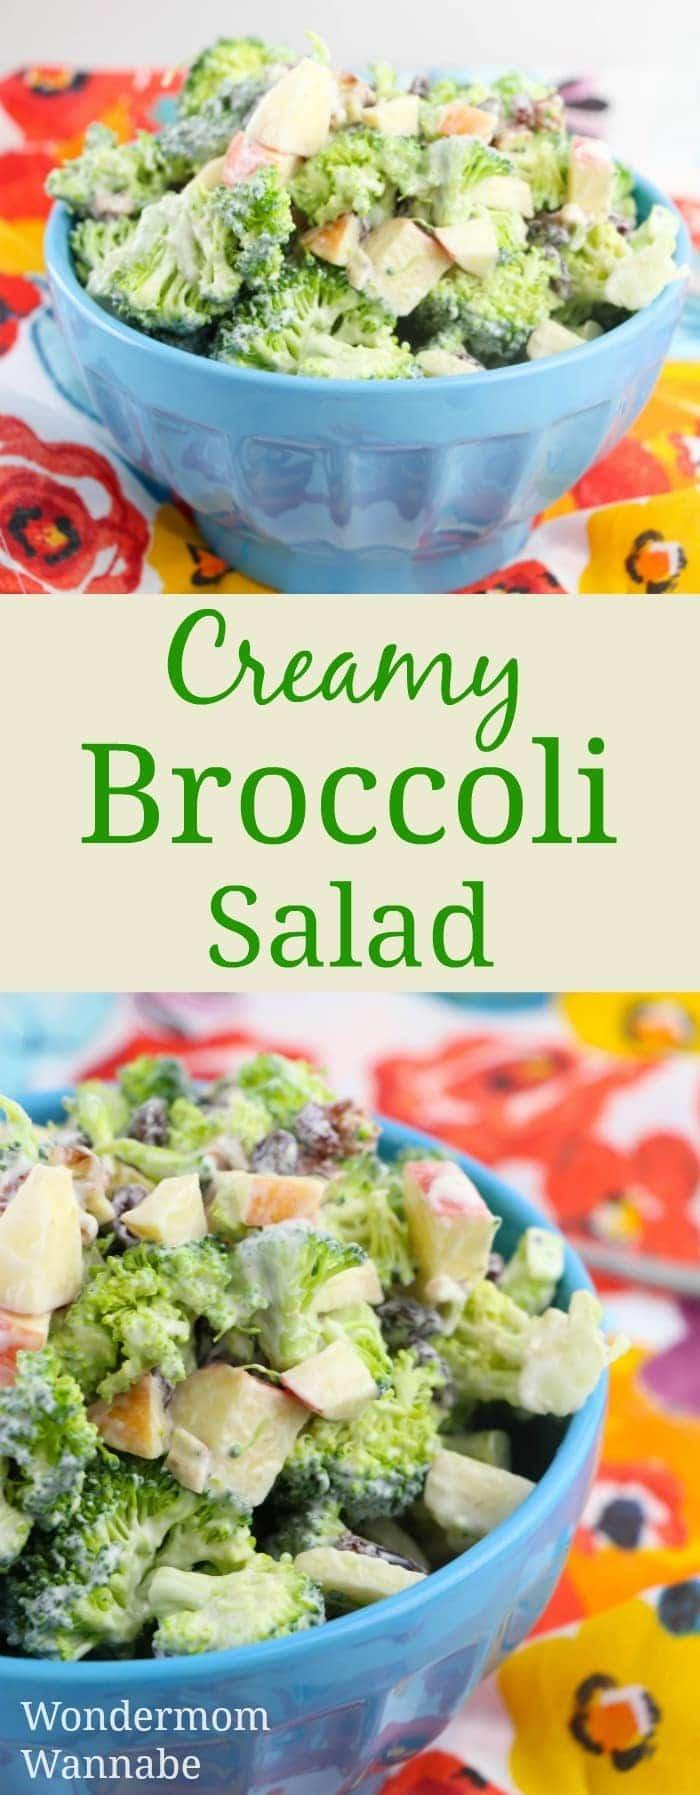 This creamy broccoli salad recipe is so easy and always a hit at picnics, potlucks and the dinner table. #broccoli #saladrecipe #broccolisalad #salad via @wondermomwannab